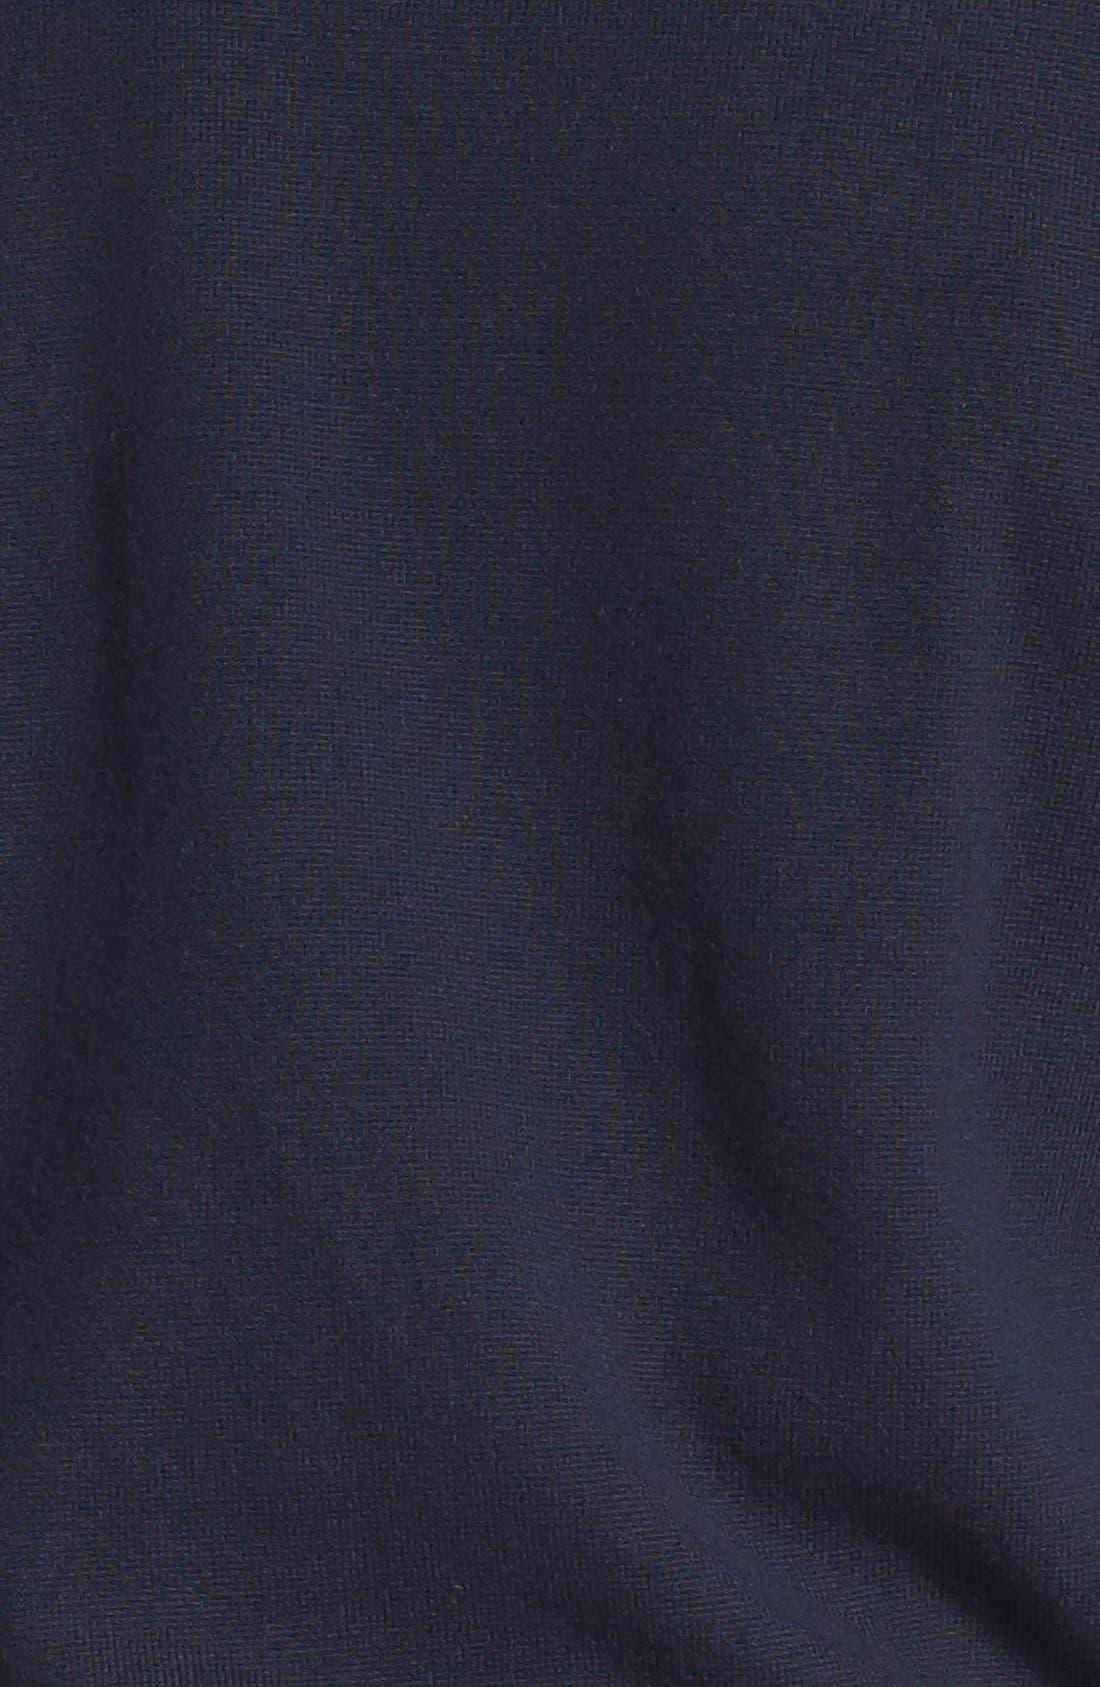 Alternate Image 3  - BOSS HUGO BOSS 'Melvern' Sweater